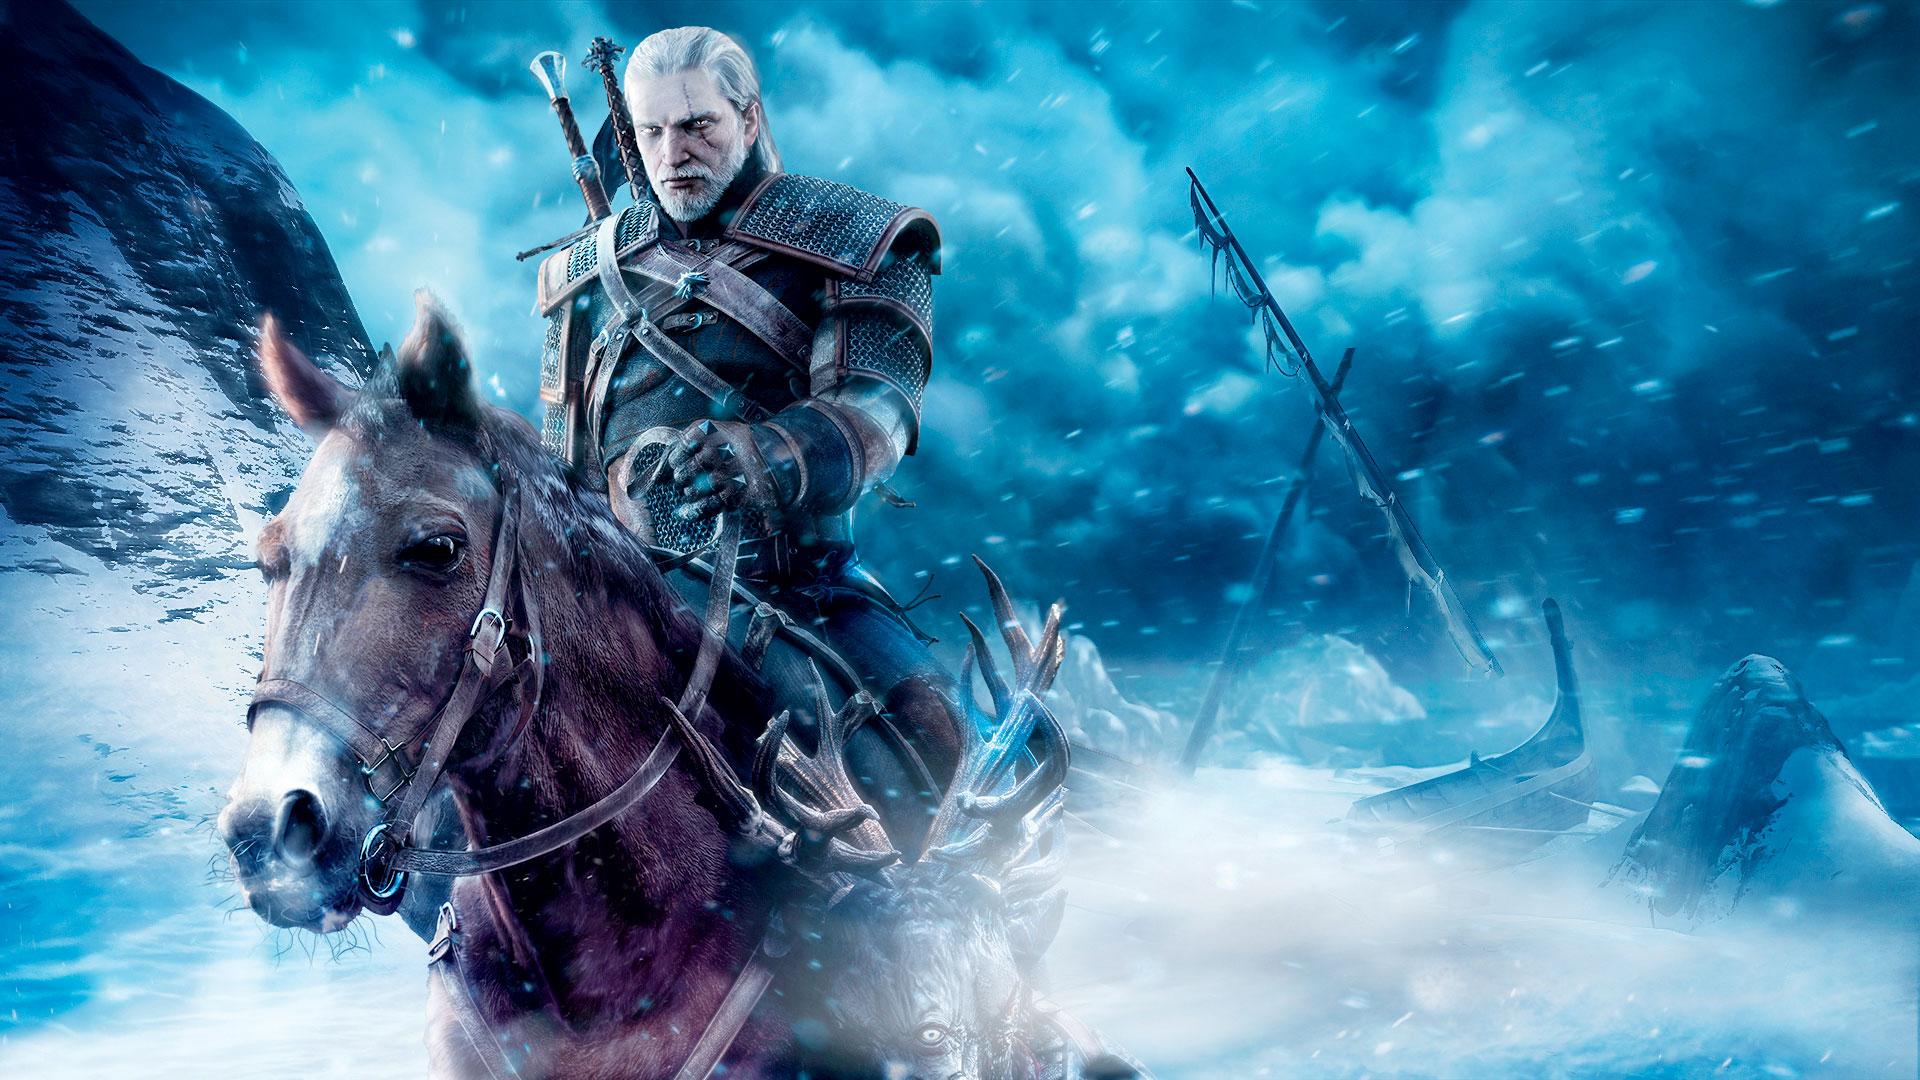 2048x2048 Anthem Ipad Air Hd 4k Wallpapers Images: 2048x2048 The Witcher 3 Wild Geralt Of Rivia Fanart Ipad